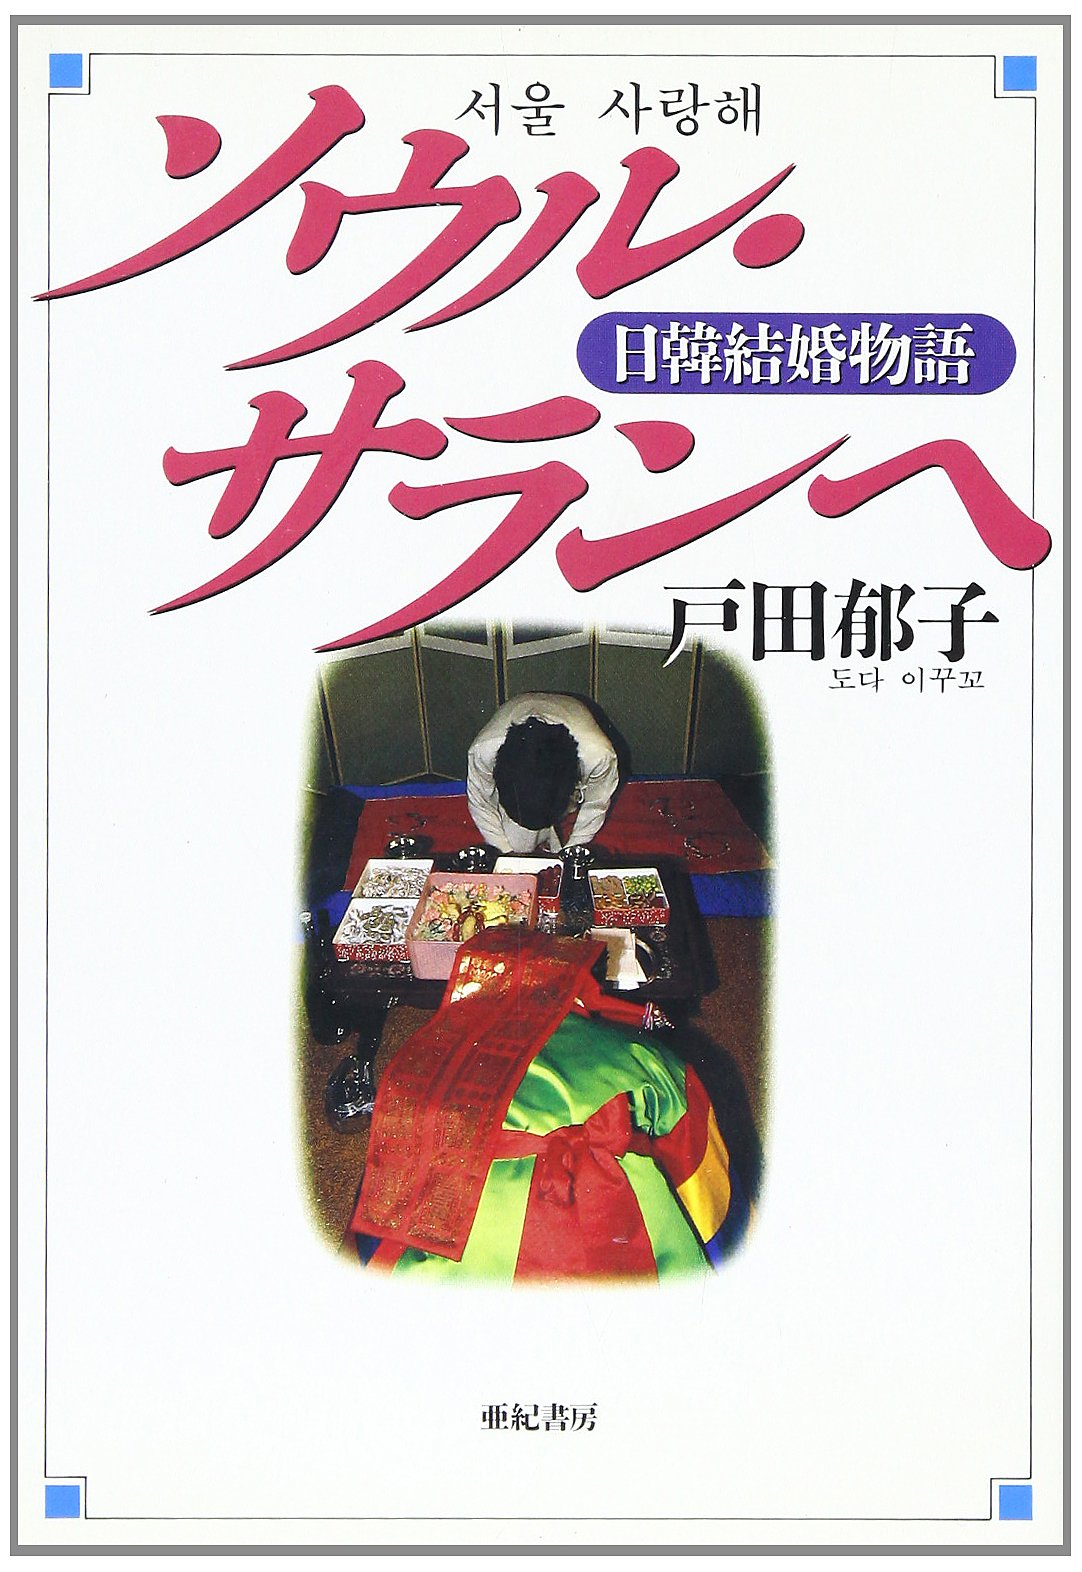 https://images-na.ssl-images-amazon.com/images/I/81dKLLdll-L.jpg